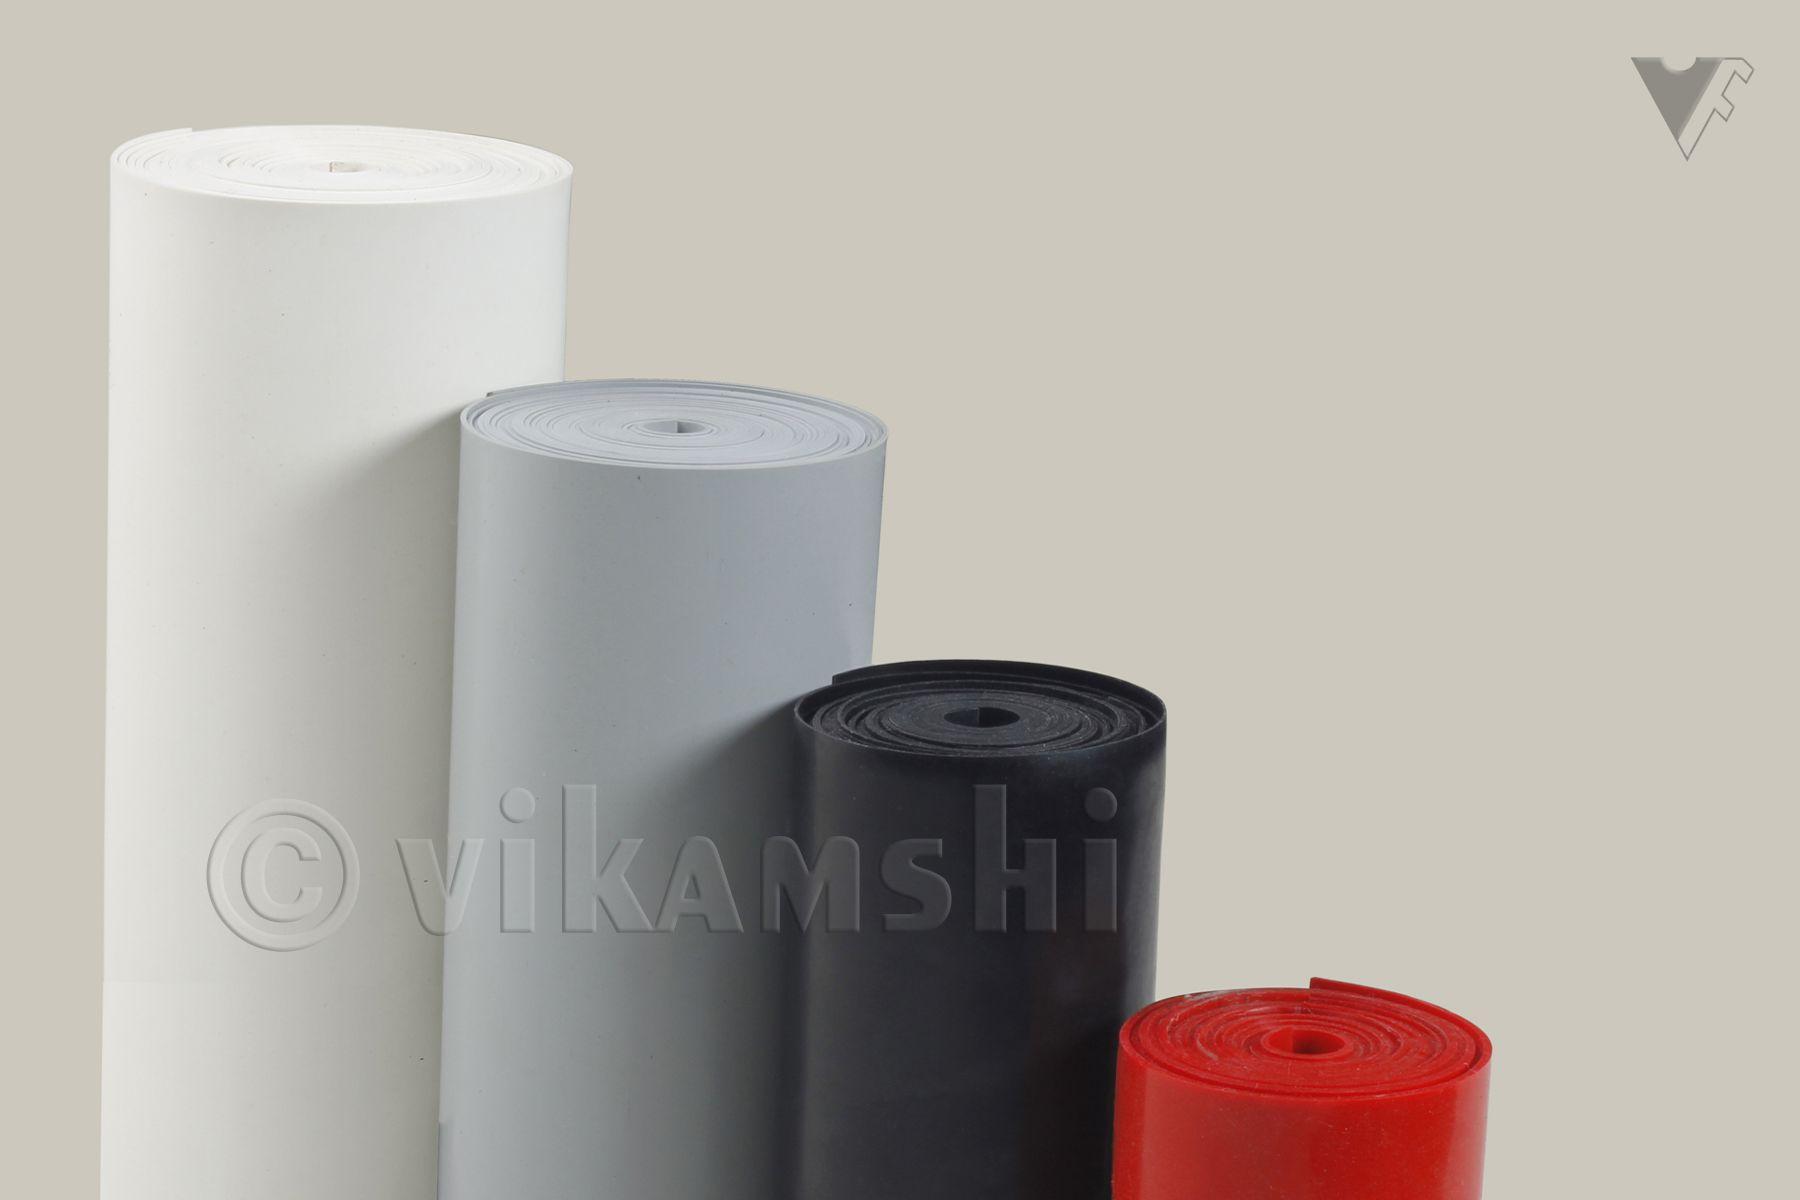 Vikamshi